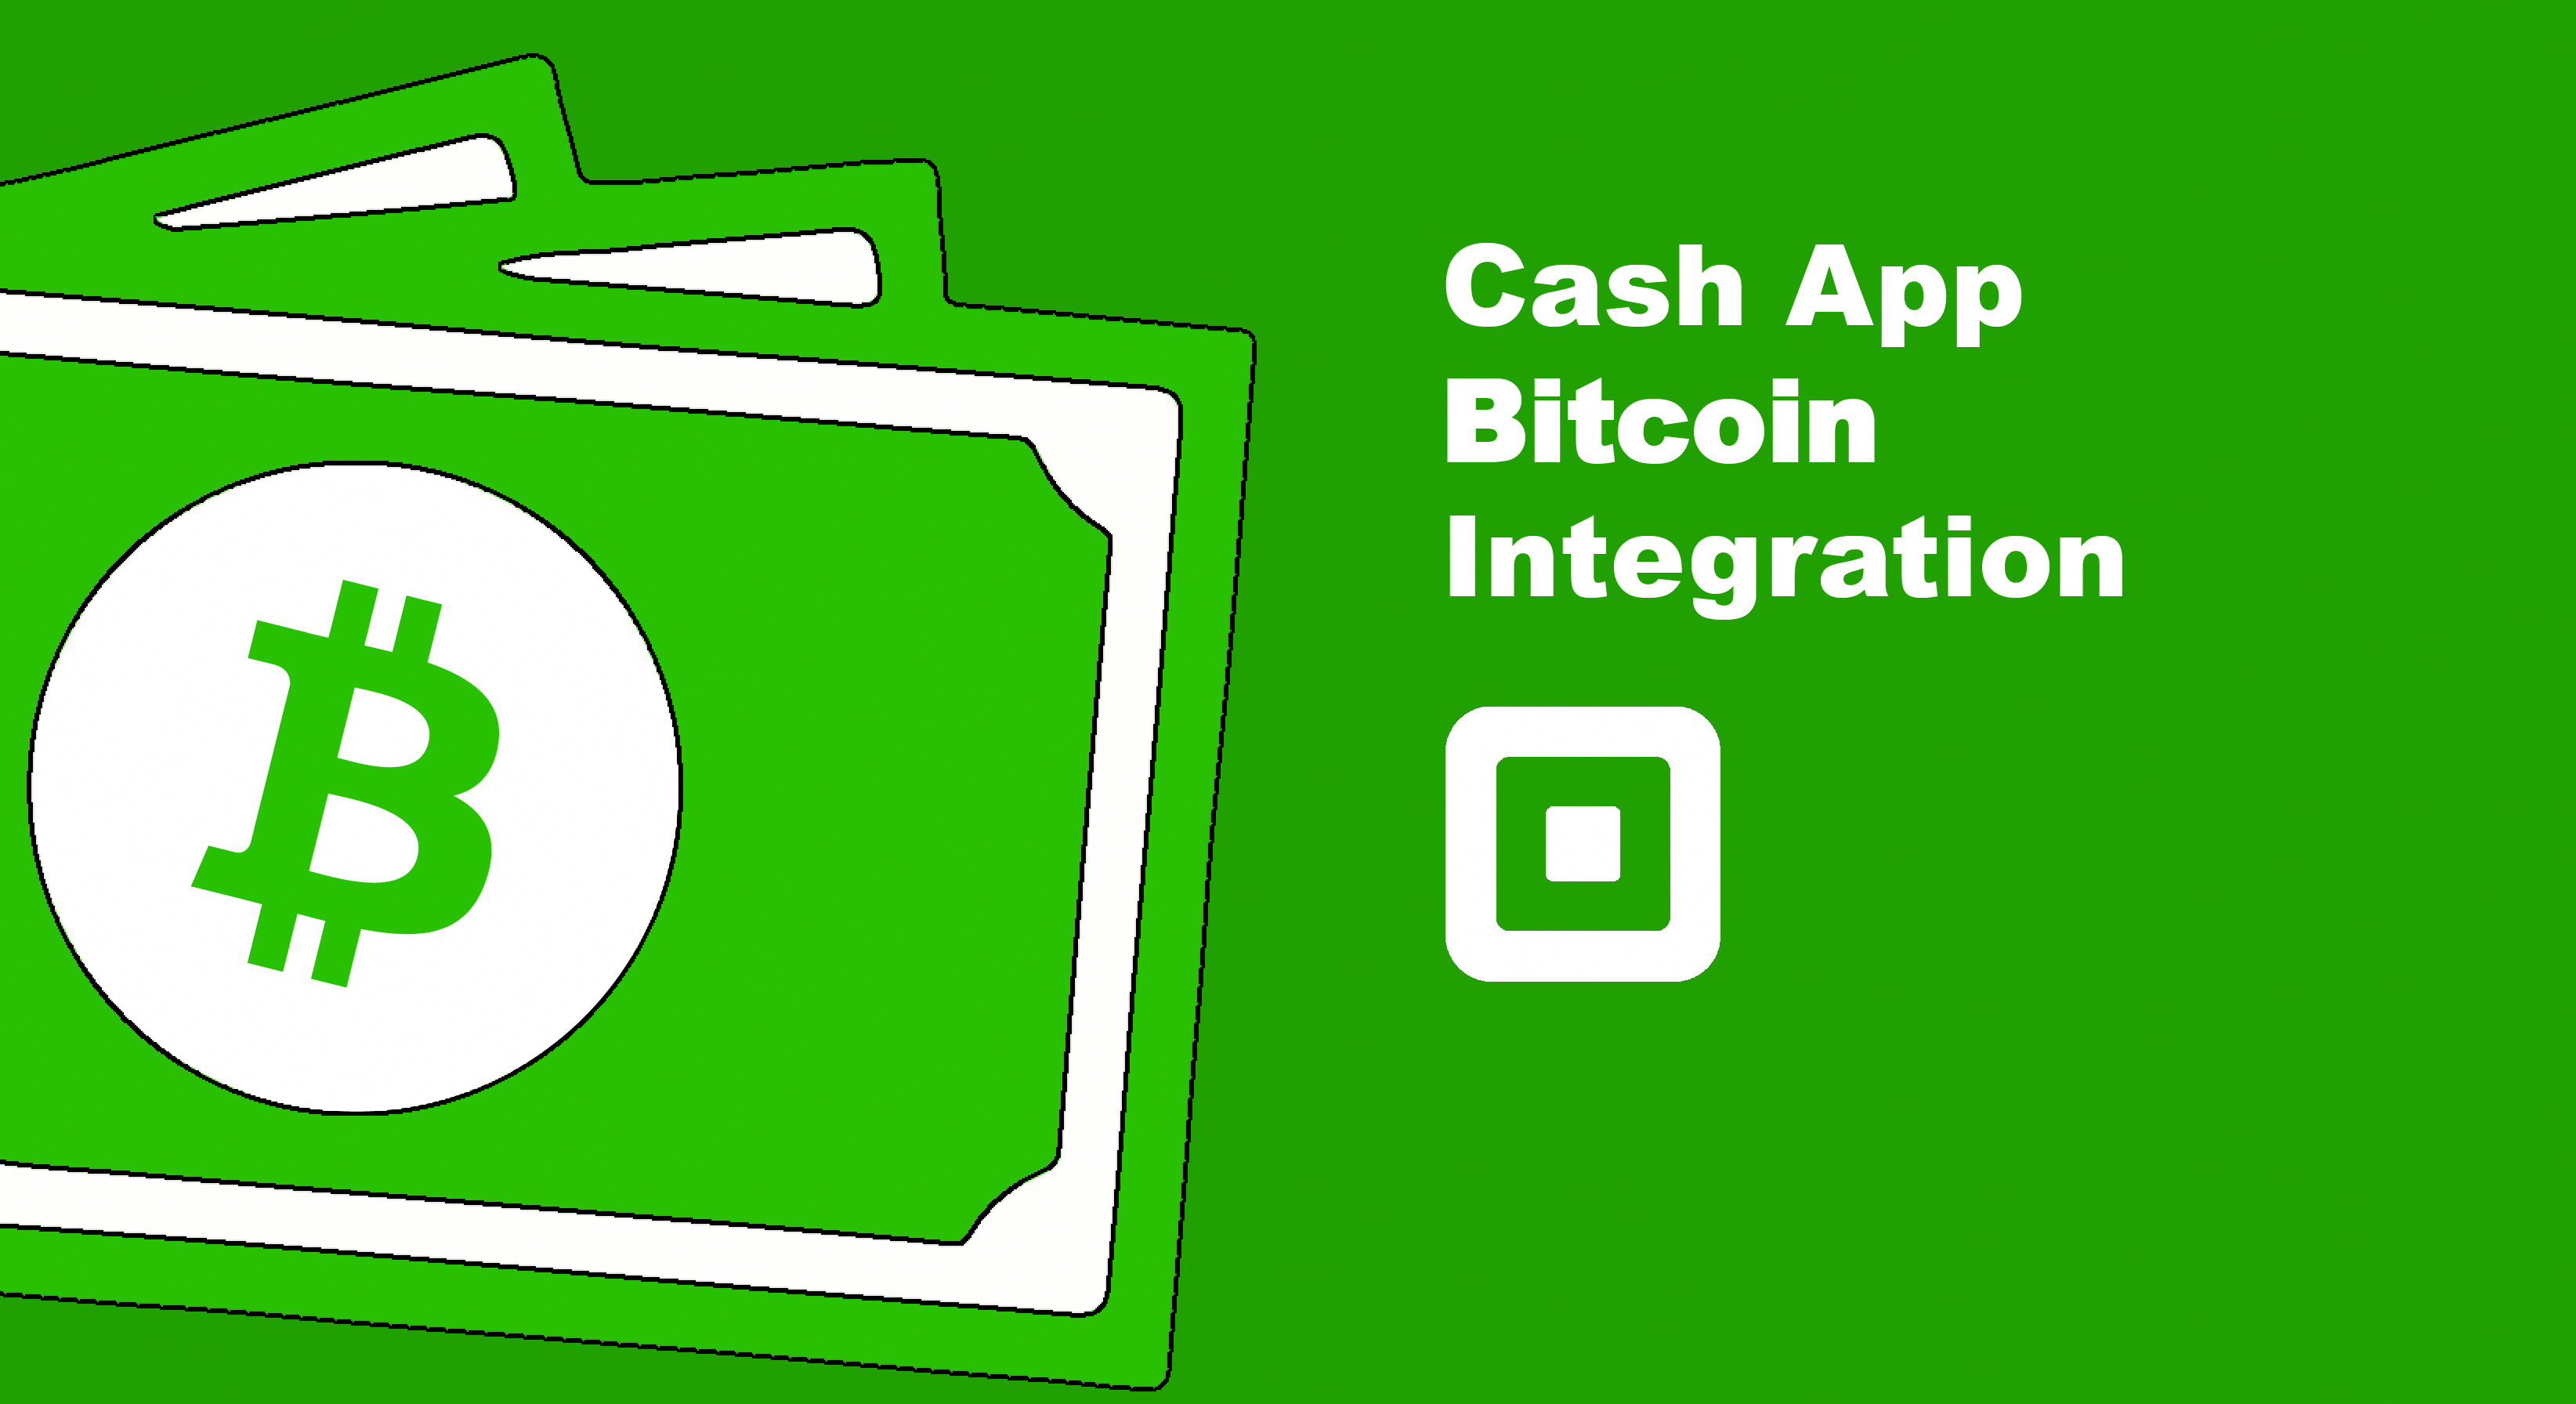 Square Cash App Launches Bitcoin Integration Bitcoin